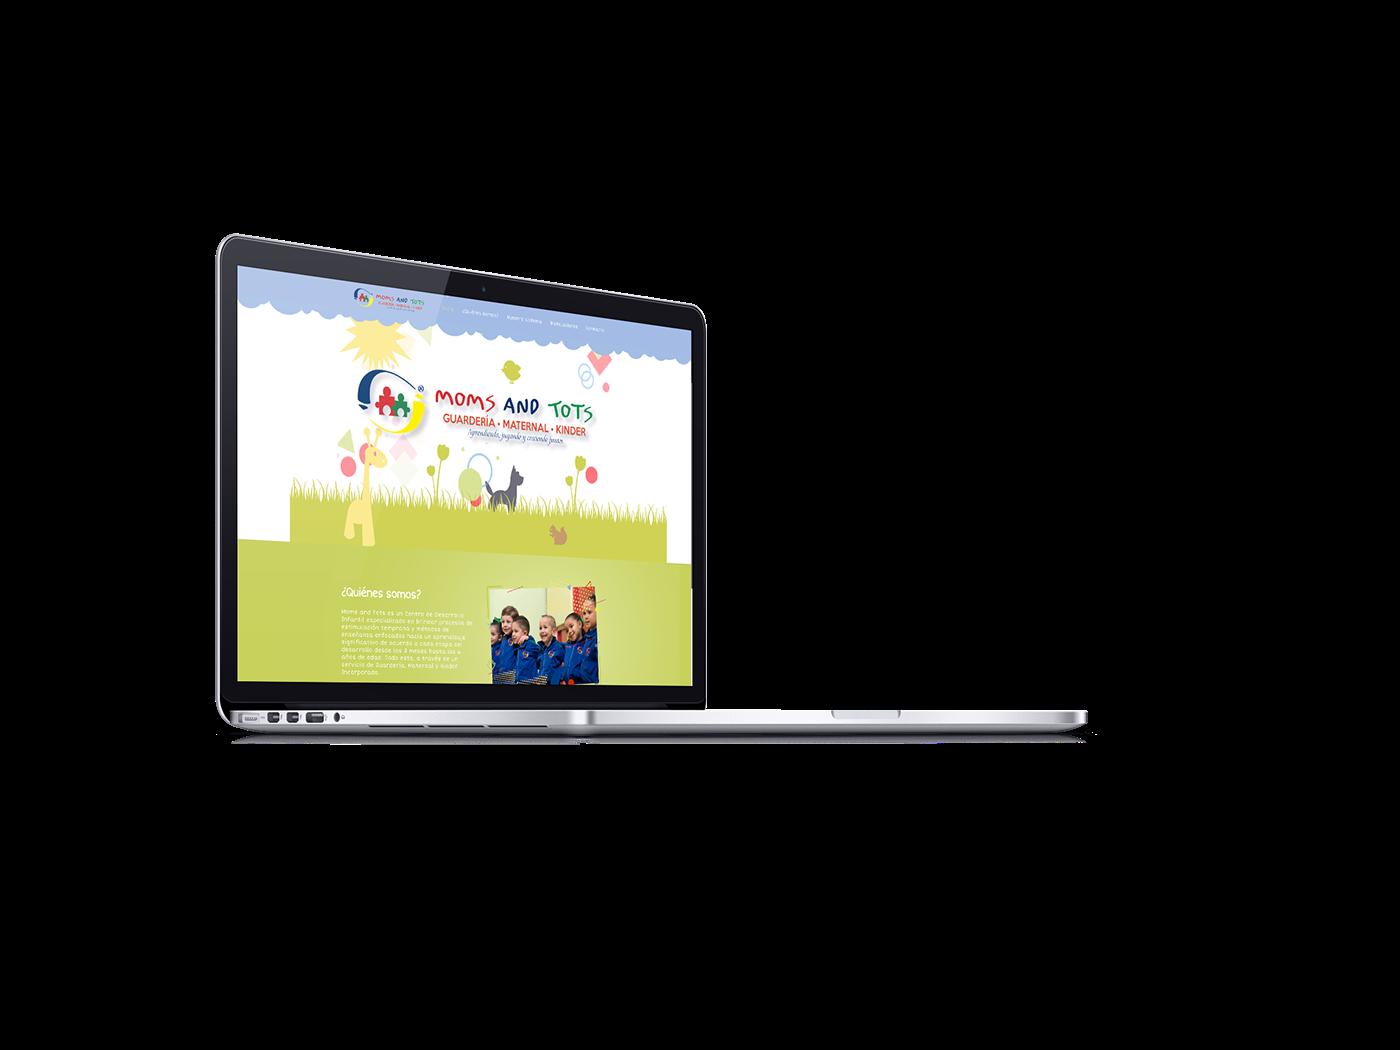 escuela kinder school Socialmedia UI UI/UX Web Webdesign wordpress